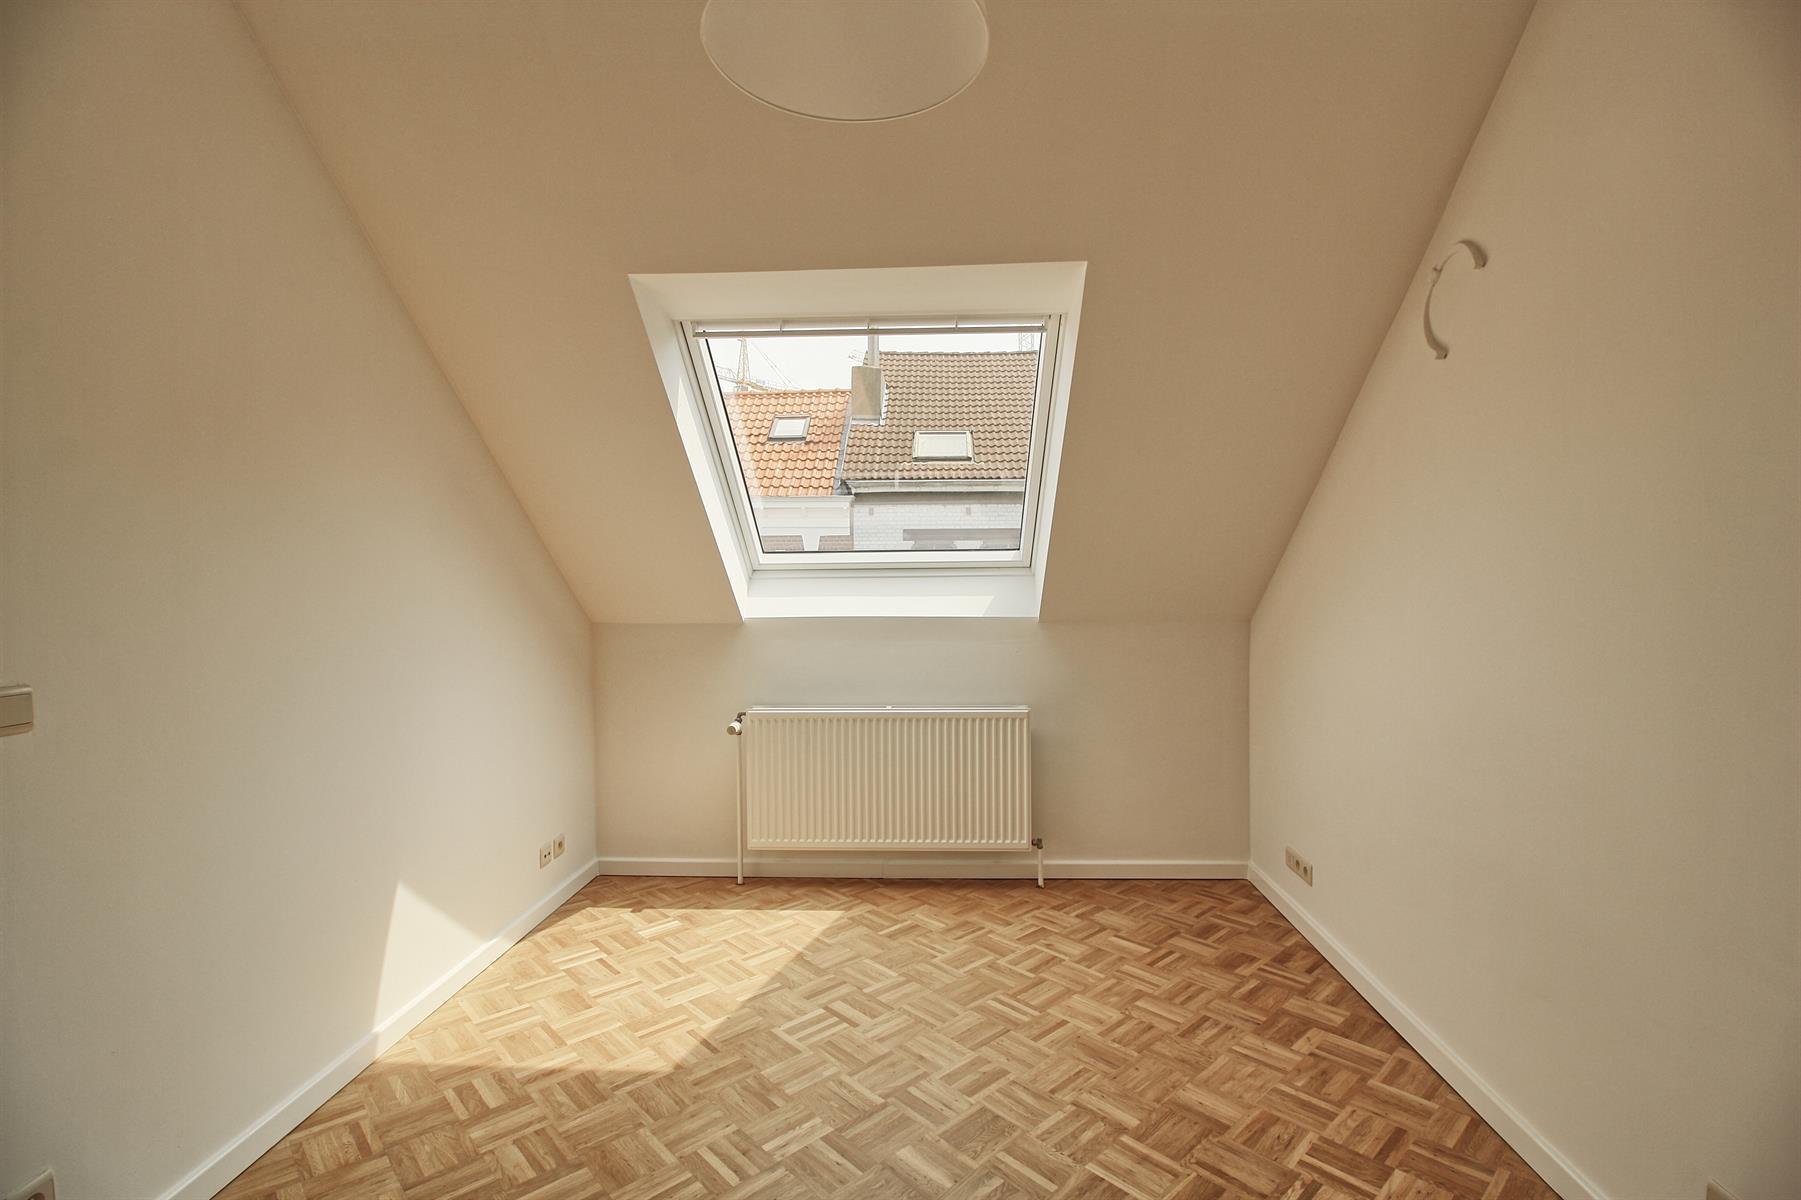 Flat - Etterbeek - #4277250-5